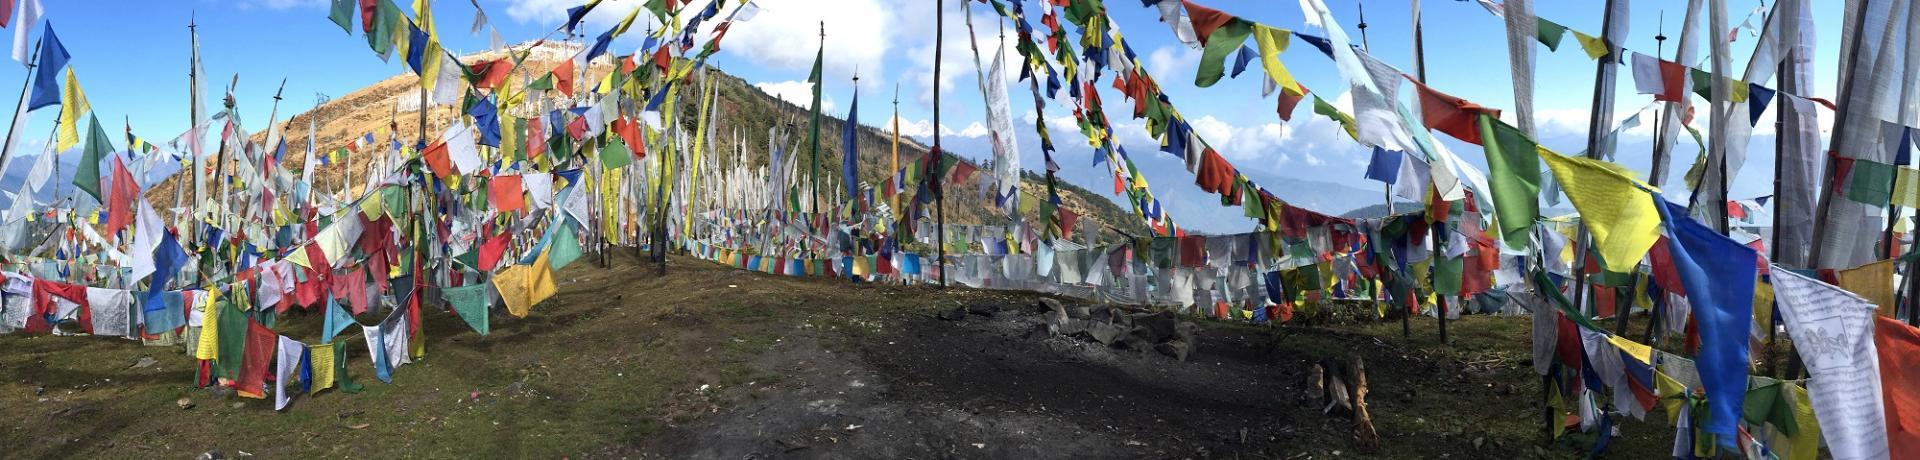 Bhutan Emotion Chele La